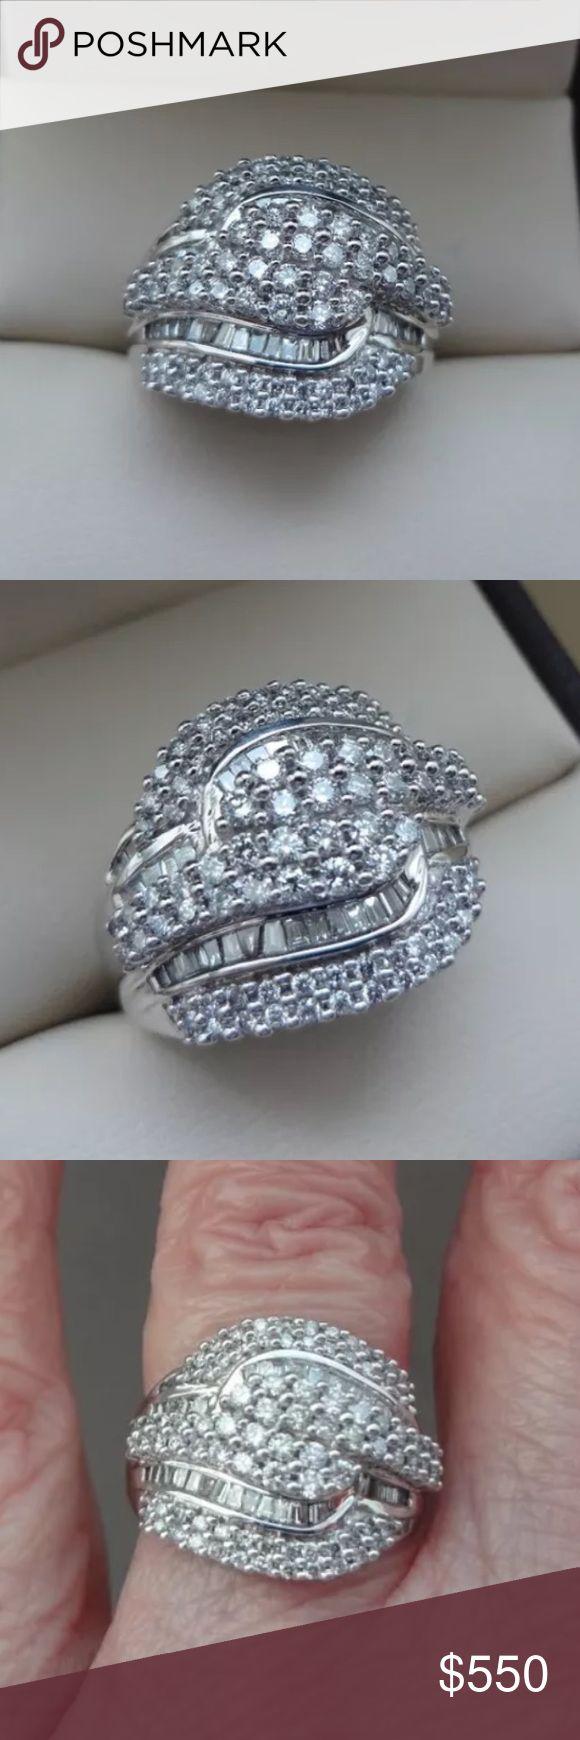 Amazing 1.20 carat 14k white gold diamond ring Amazing 1.20 carat 14k white gold diamond ring Jewelry Rings